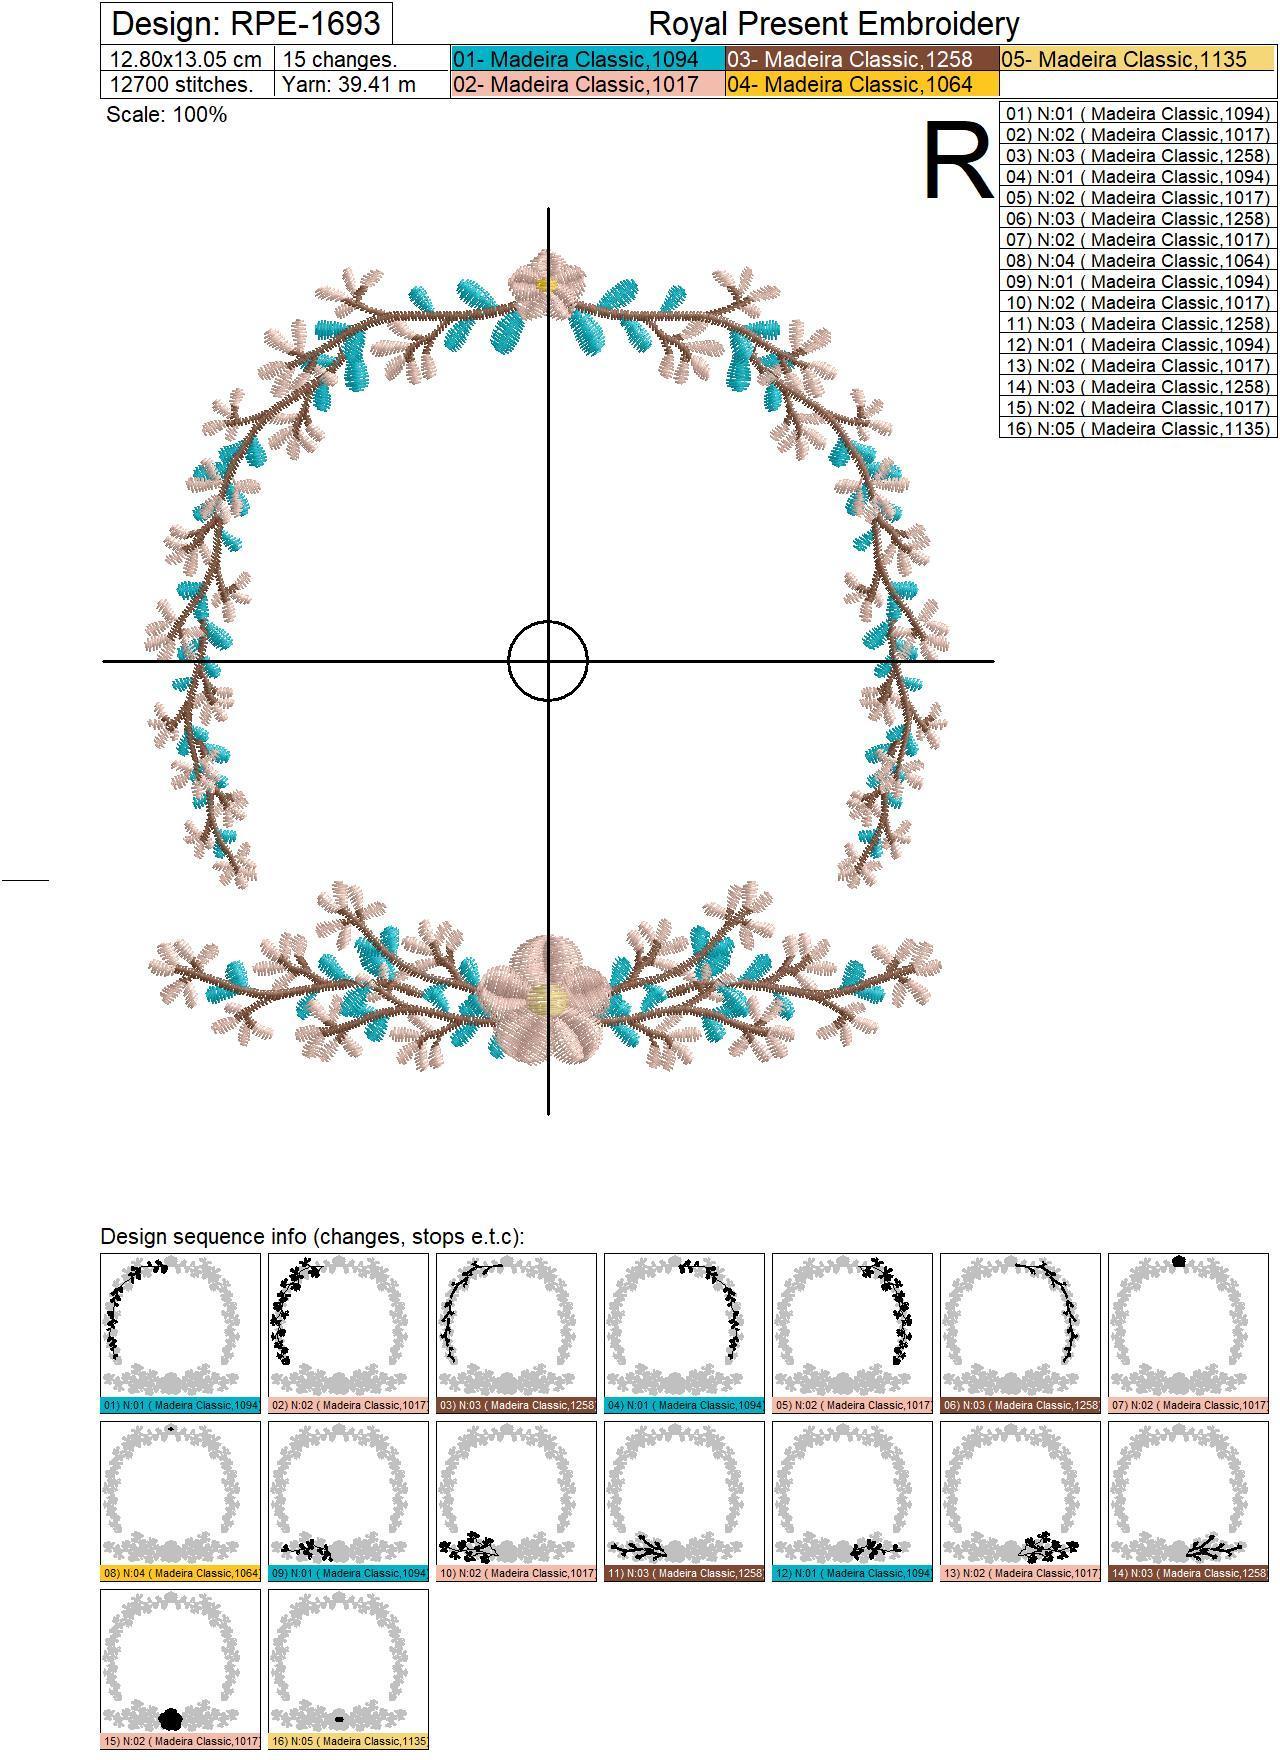 Floral Frame for monogram Embroidery Design - 3 sizes